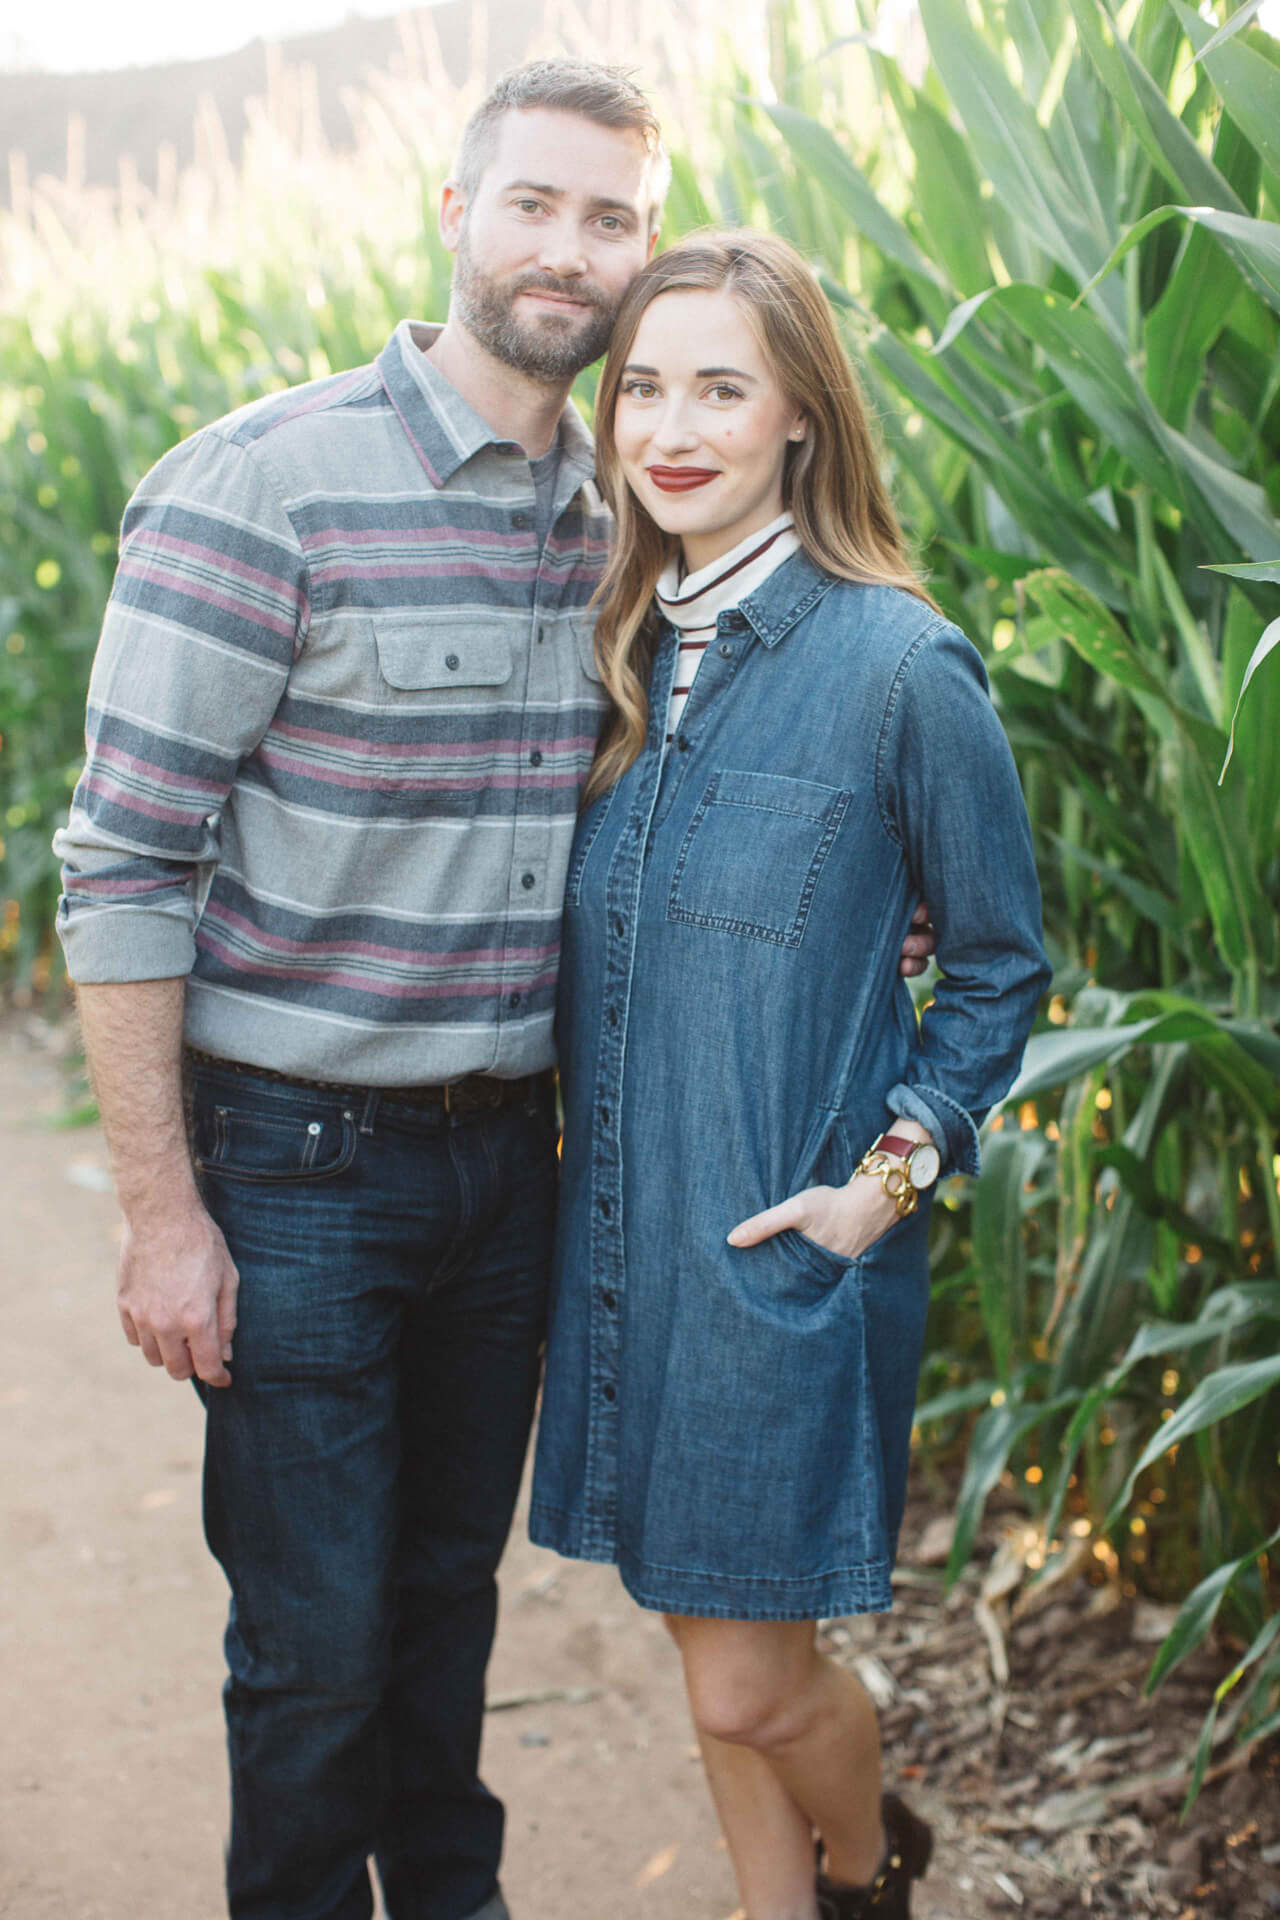 Mara and Matthew at the corn maze